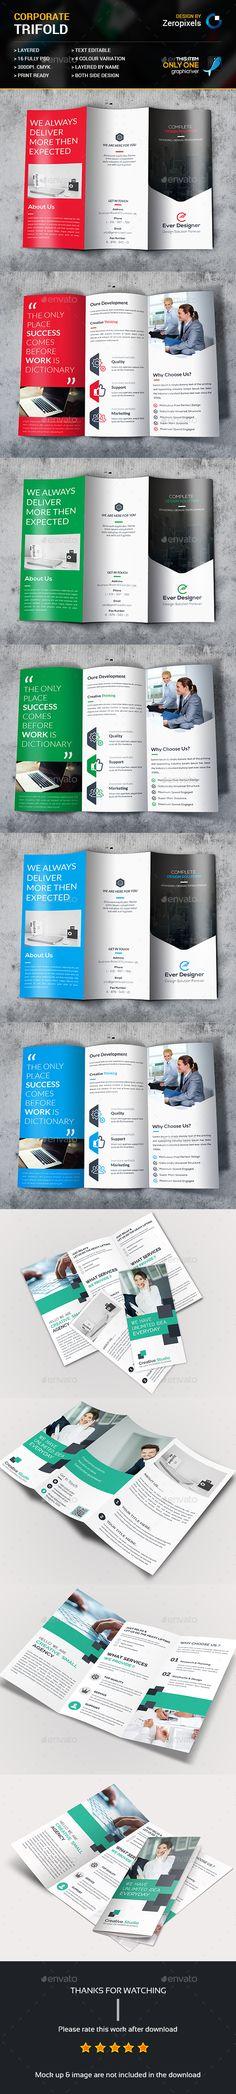 Trifold Brochure Bundle